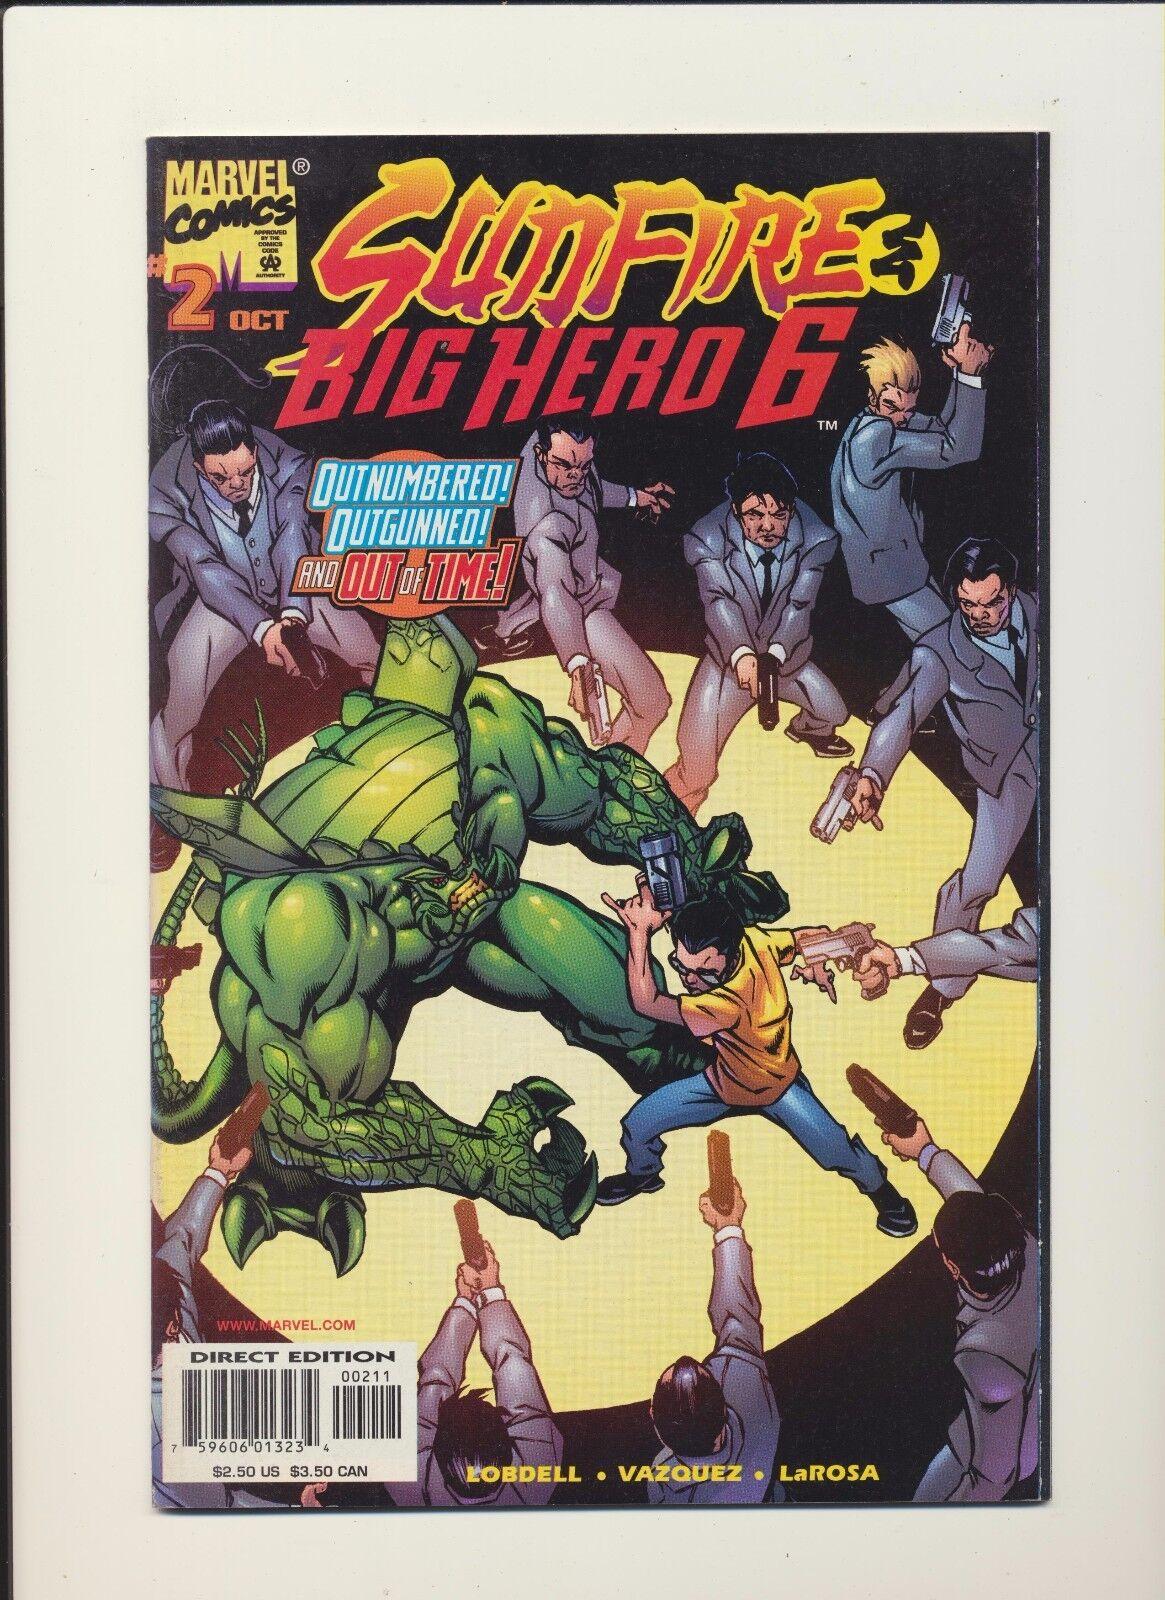 Big Hero Comic sunfire & big hero six #1 (sep 1998, marvel)